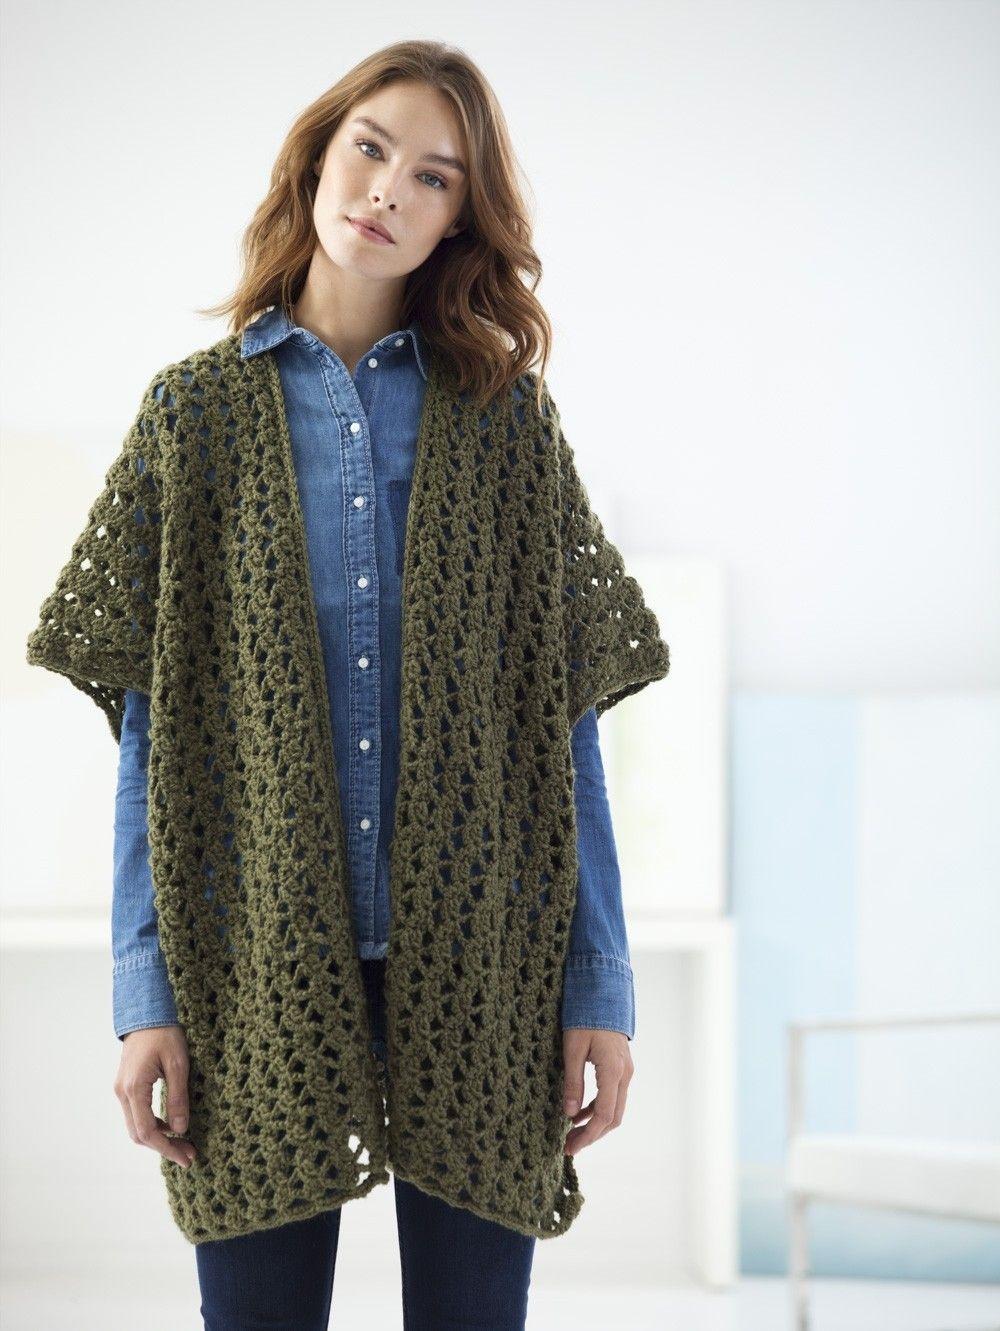 Darlington Ruana (Crochet)   Crocheting   Pinterest   Crochet, Shawl ...